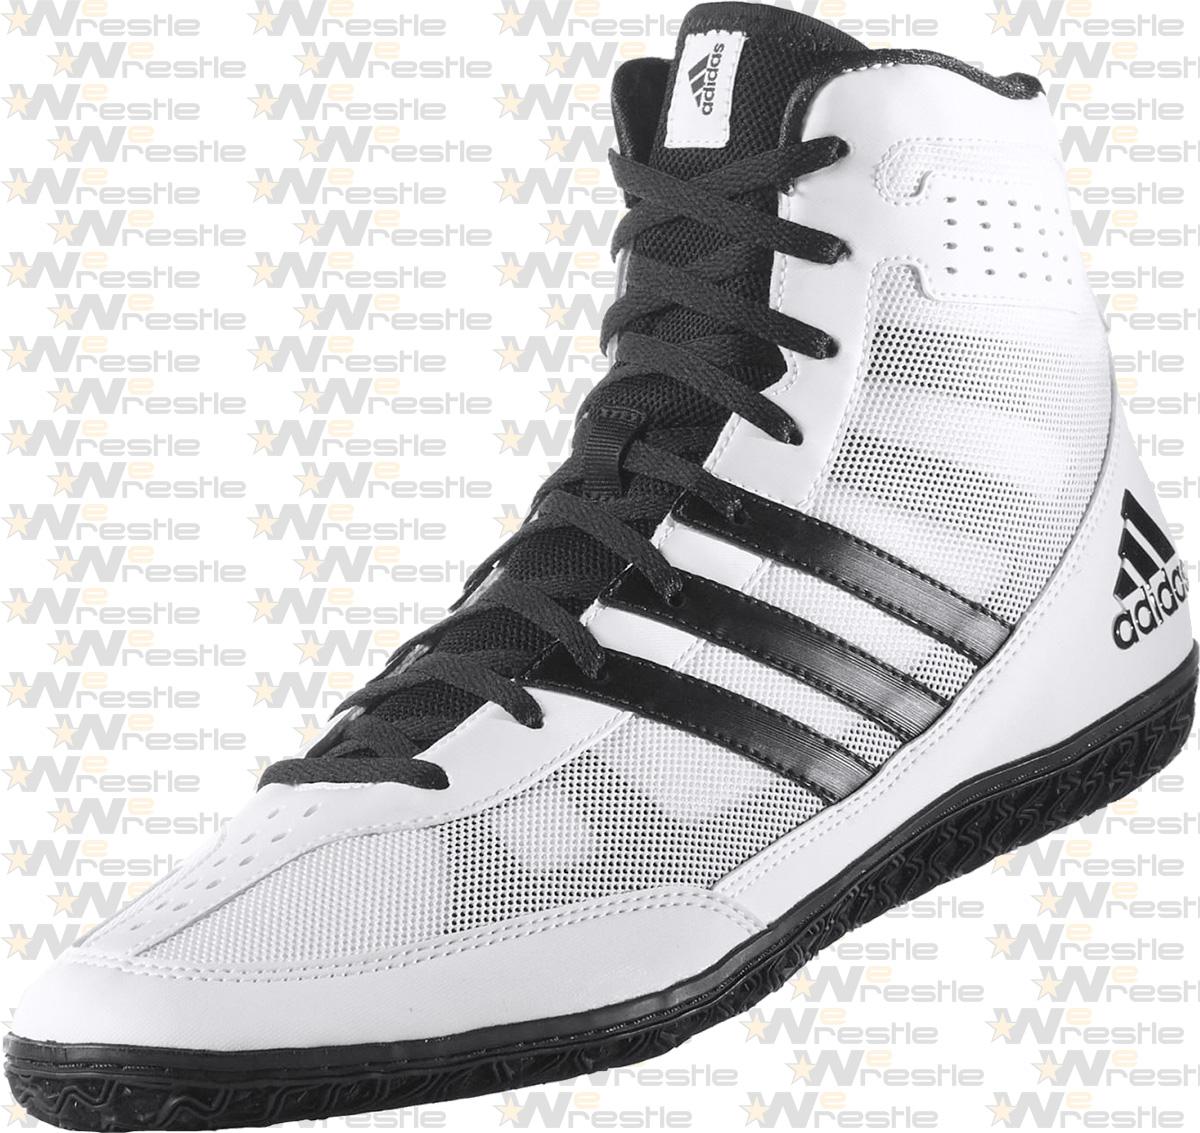 02e789f9c33d adidas Mat Wizard Wrestling Shoes